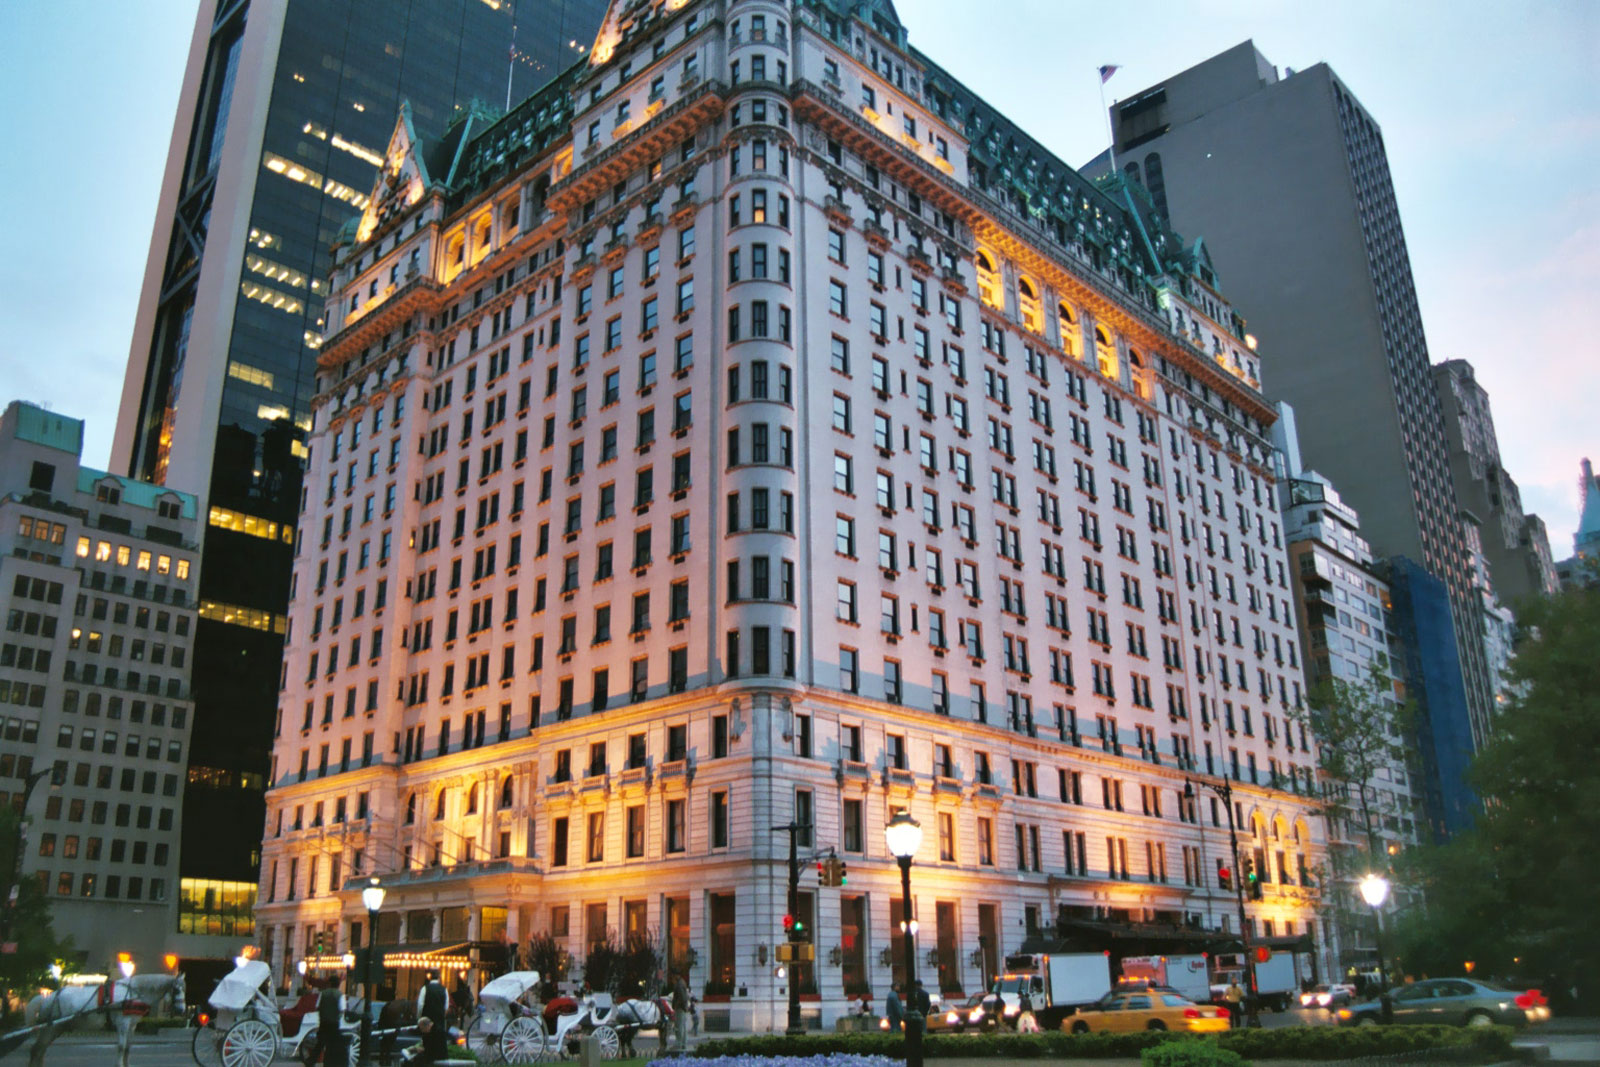 top hotels in new york city with big legacies world bride magazine. Black Bedroom Furniture Sets. Home Design Ideas